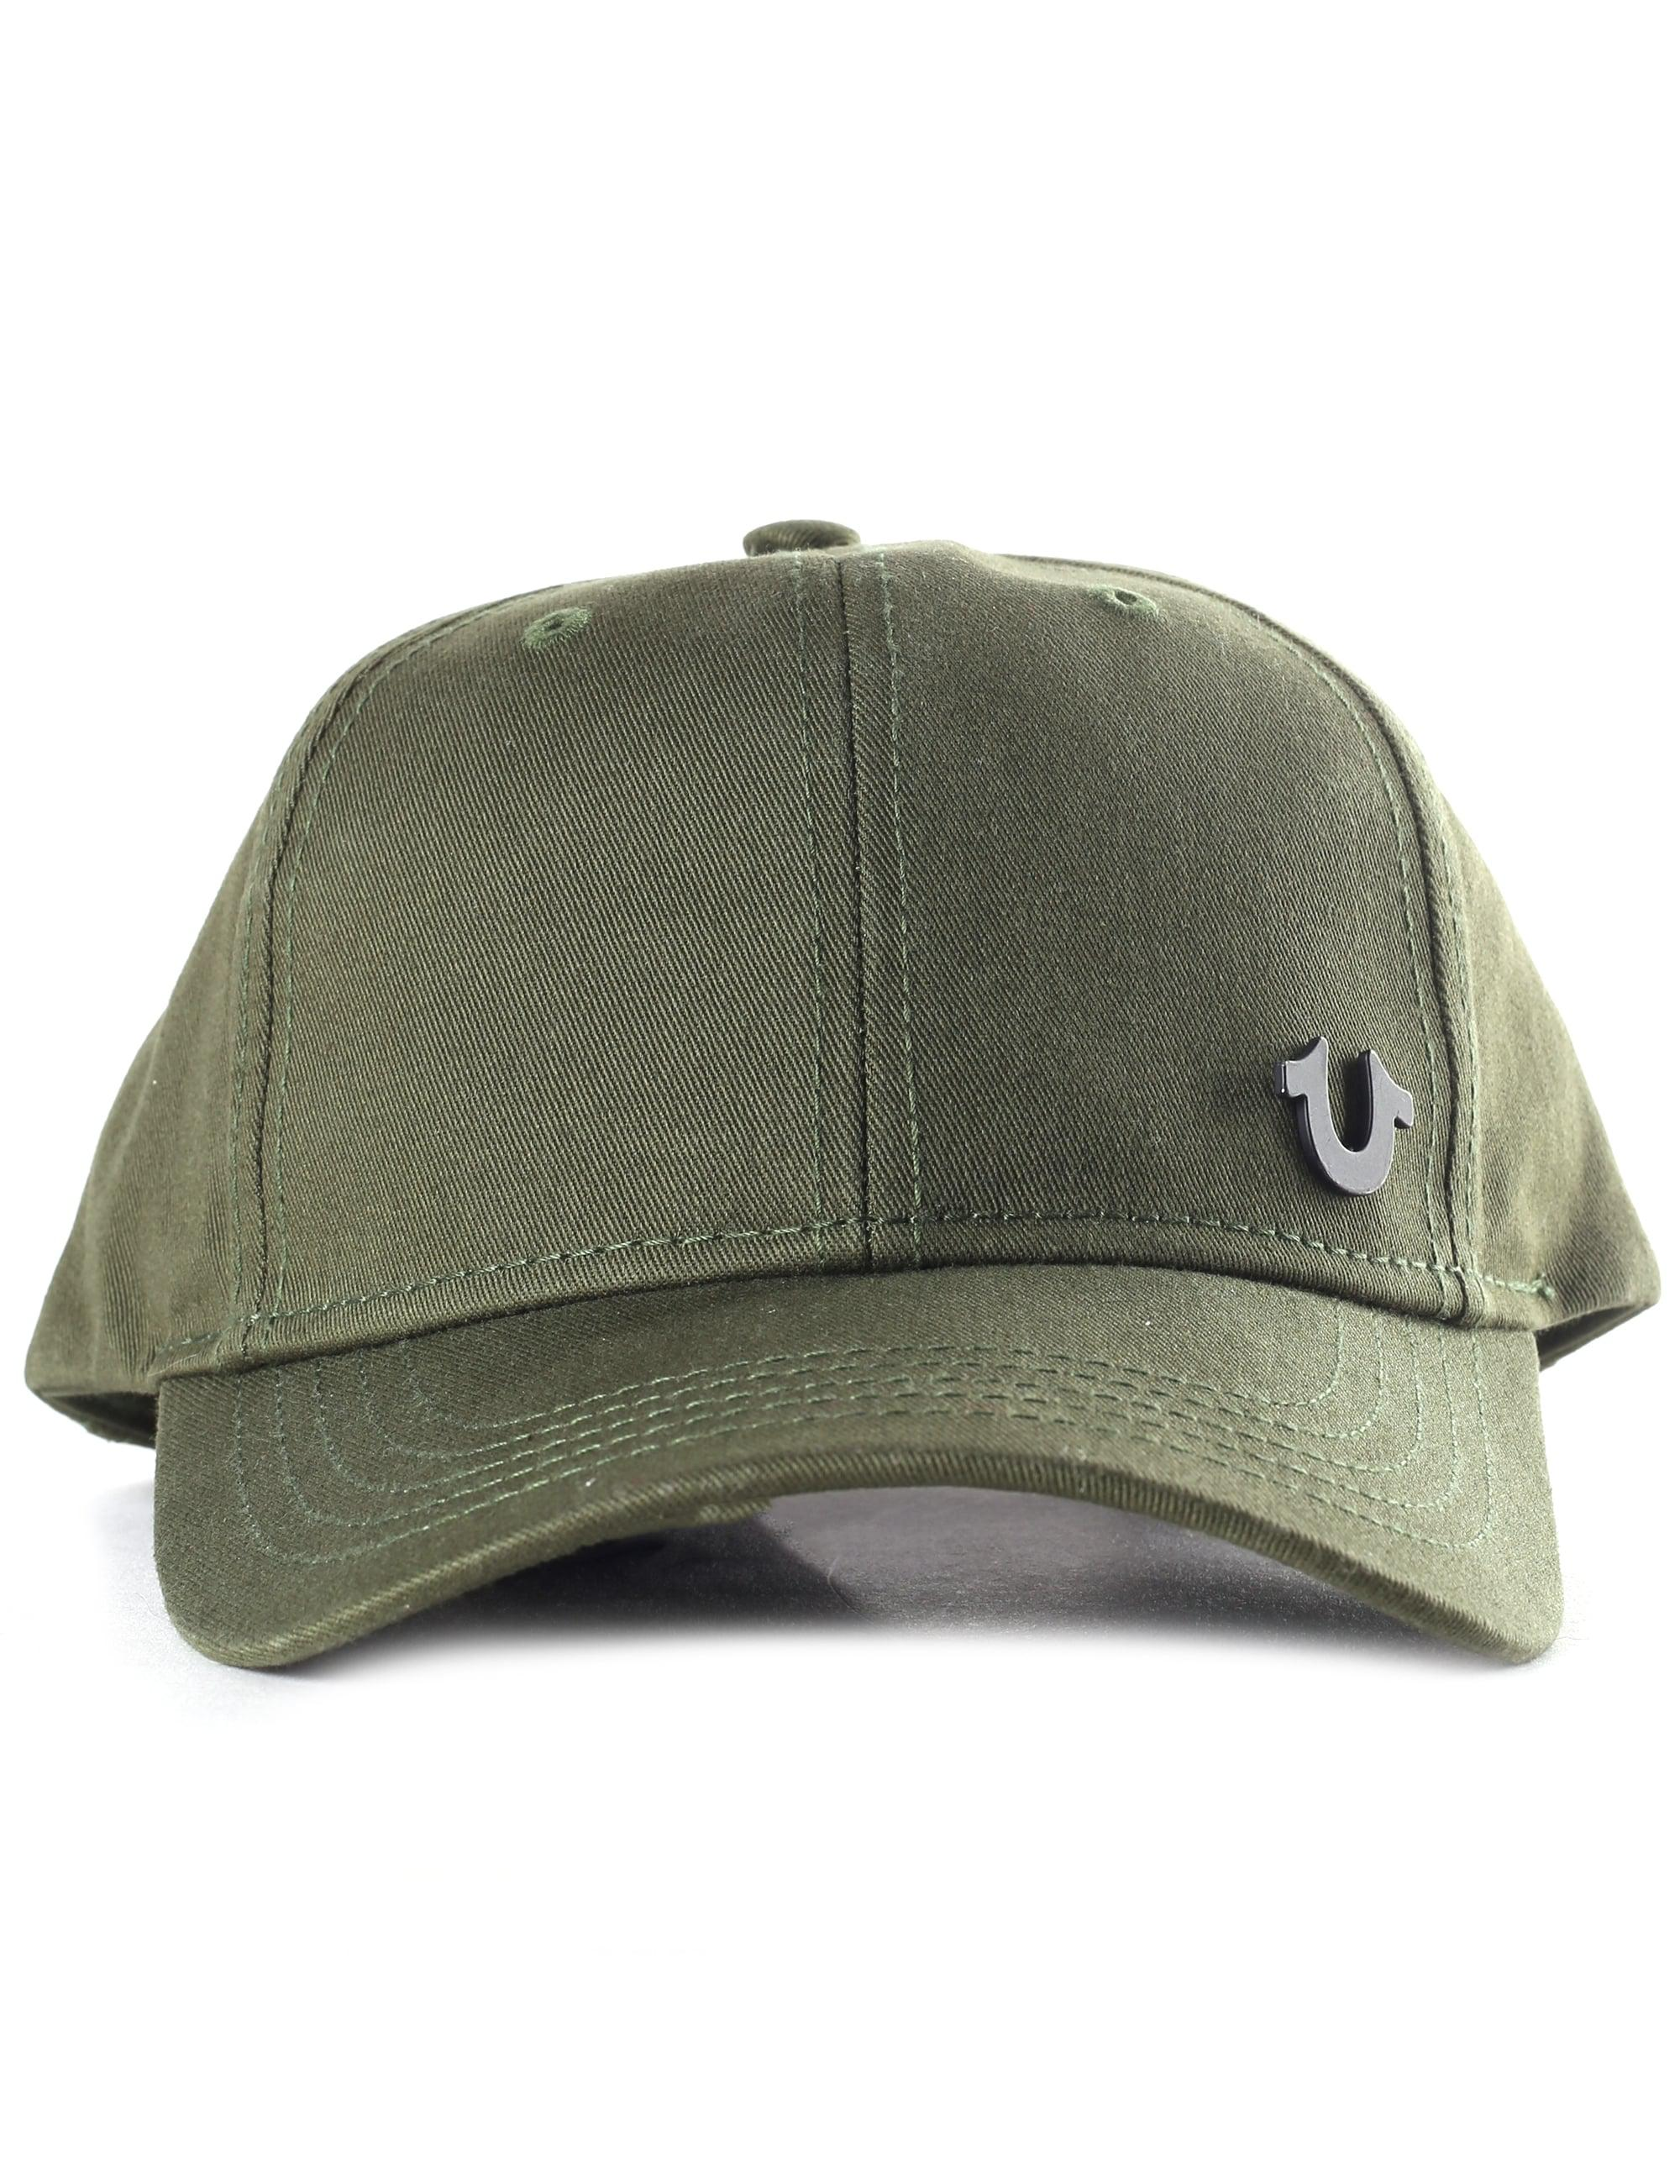 3b924f54031 True Religion Core Logo Men s Baseball Cap Military black in Green ...